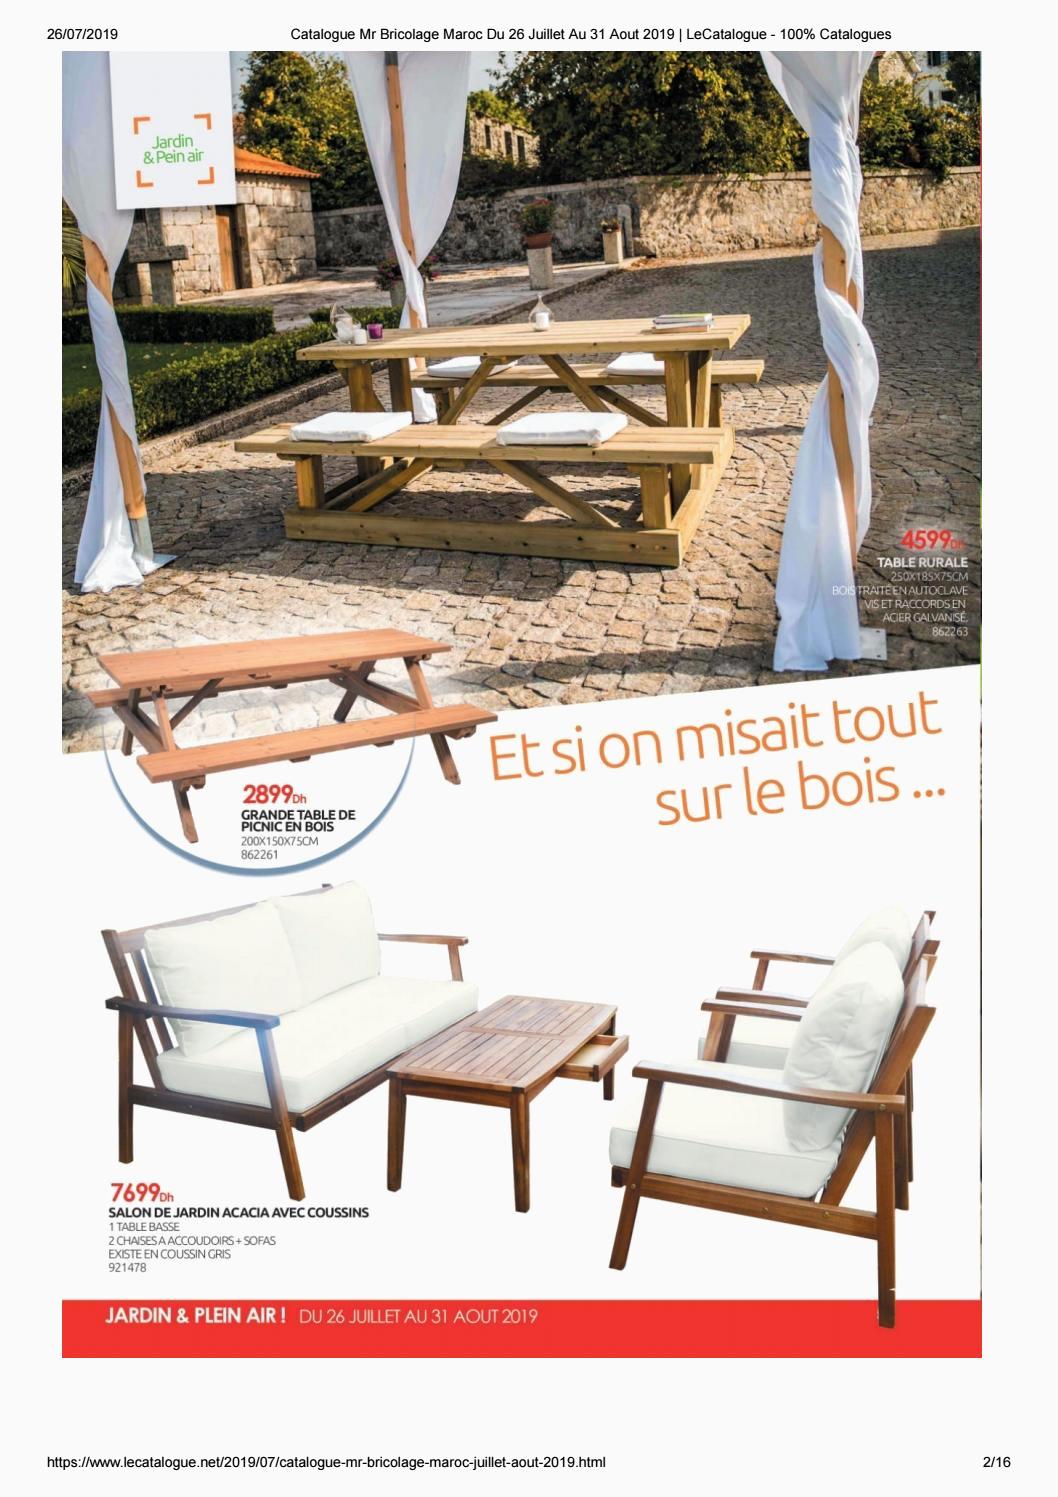 40 Charmant Table De Jardin Mr Bricolage | Table pour Incinérateur De Jardin Mr Bricolage